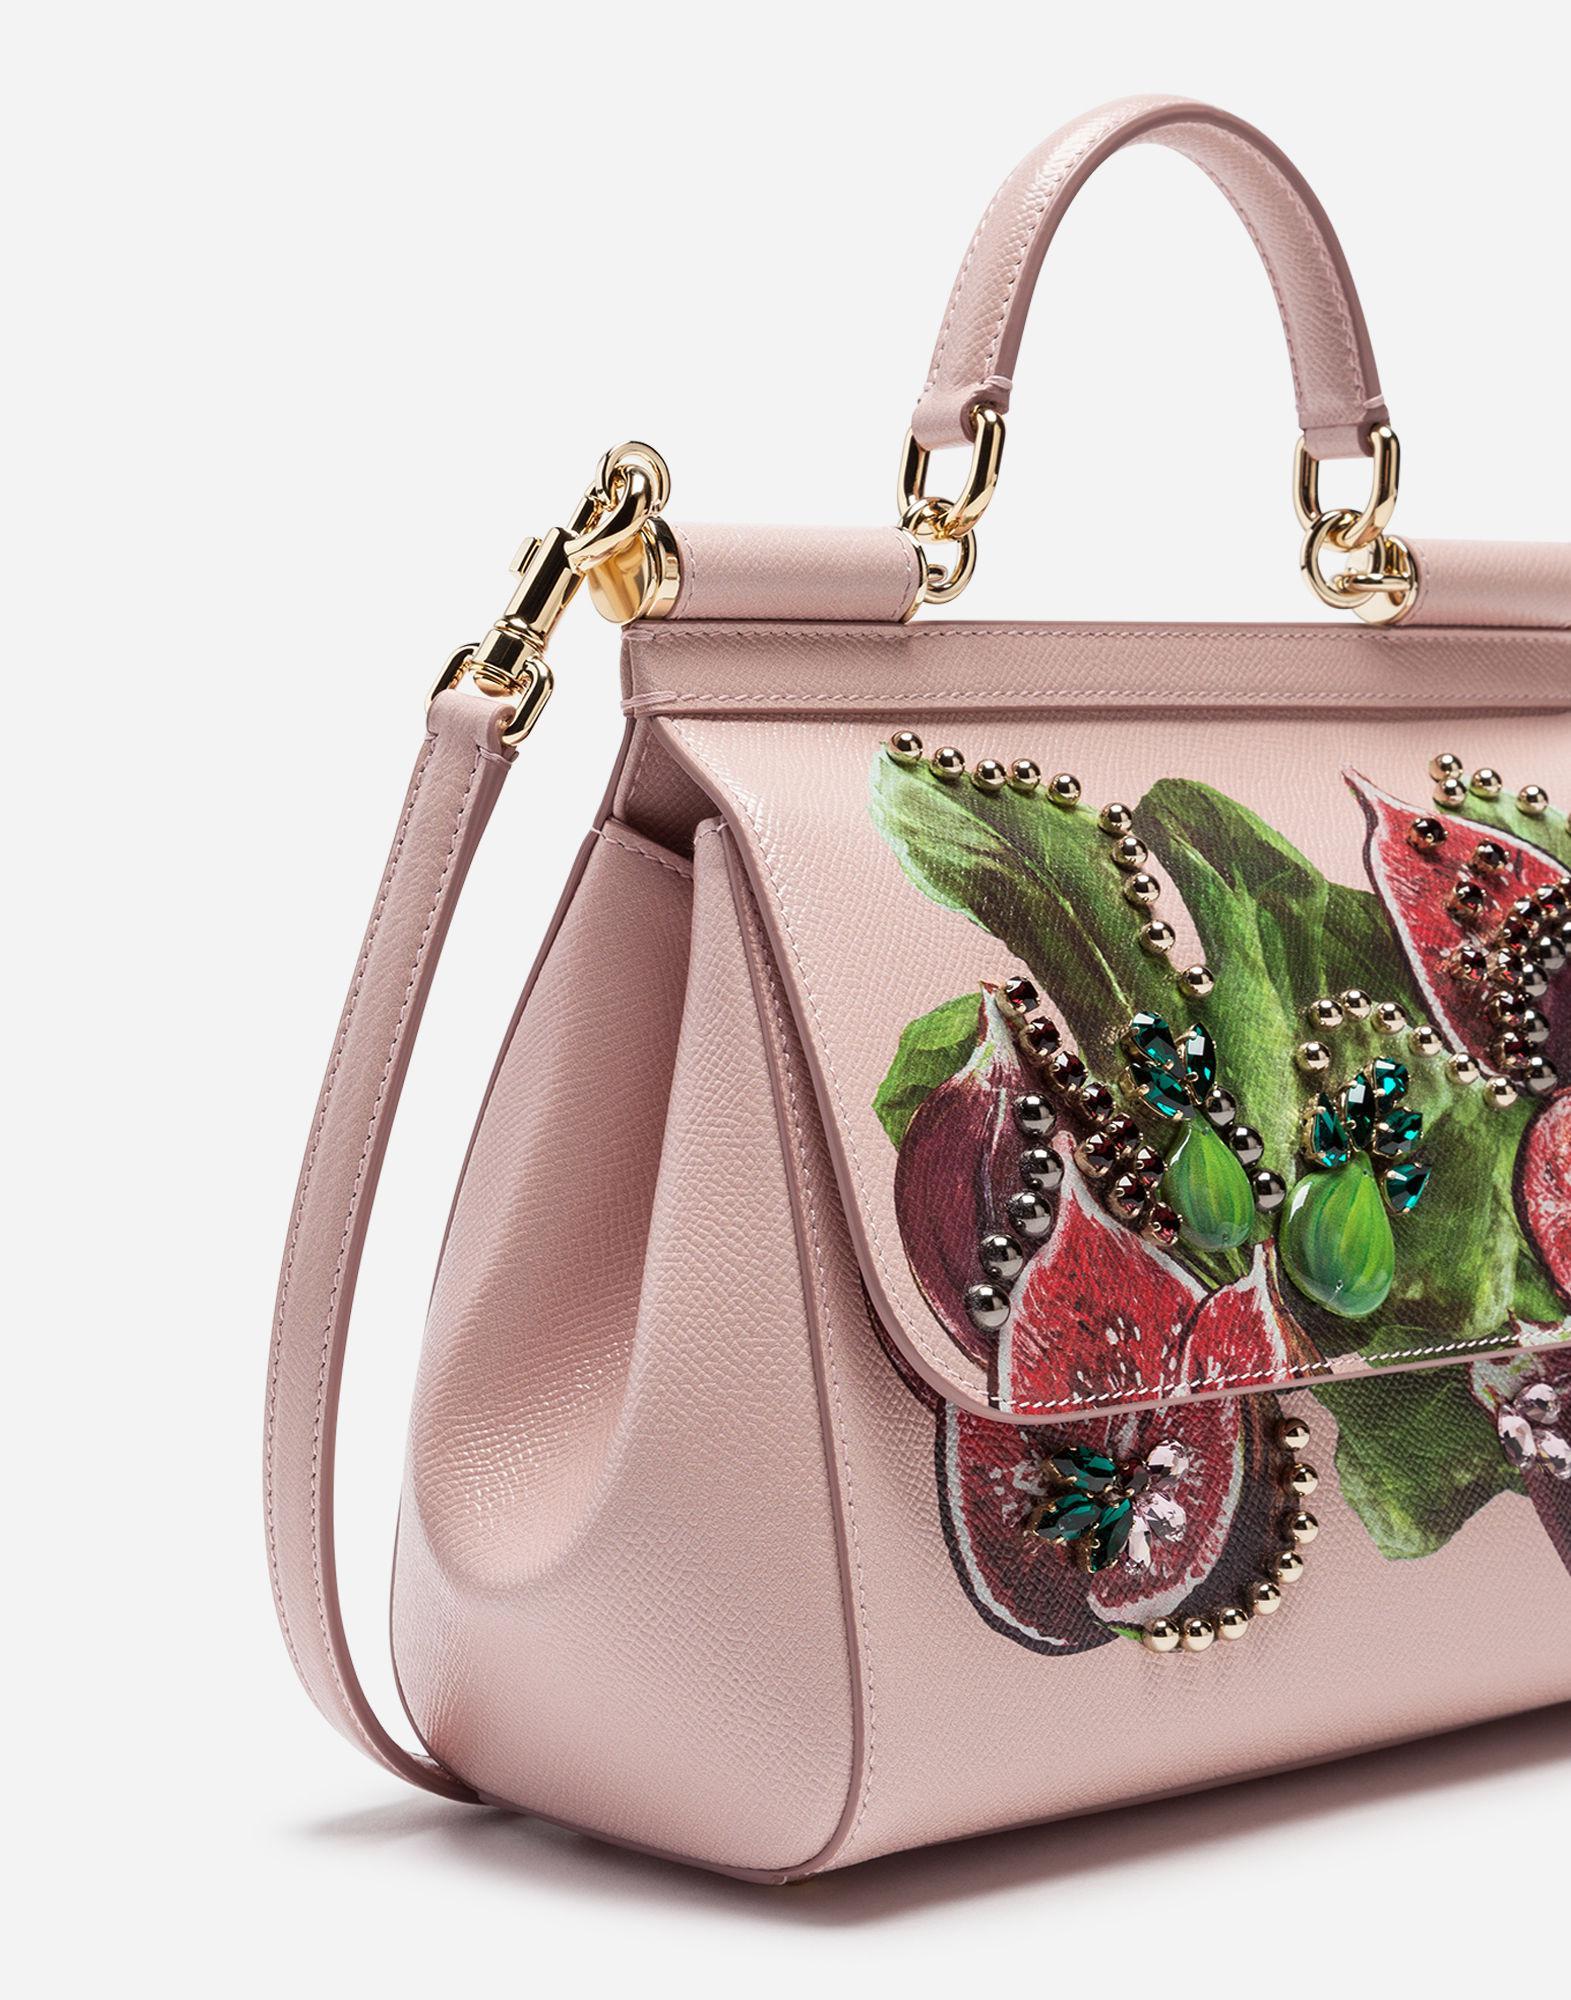 8c712c3f9fa ... Lyst - Dolce Gabbana Sicily Handbag In Printed Dauphine Calfskin in Pink  size 40 5bdf5 86e9b ...